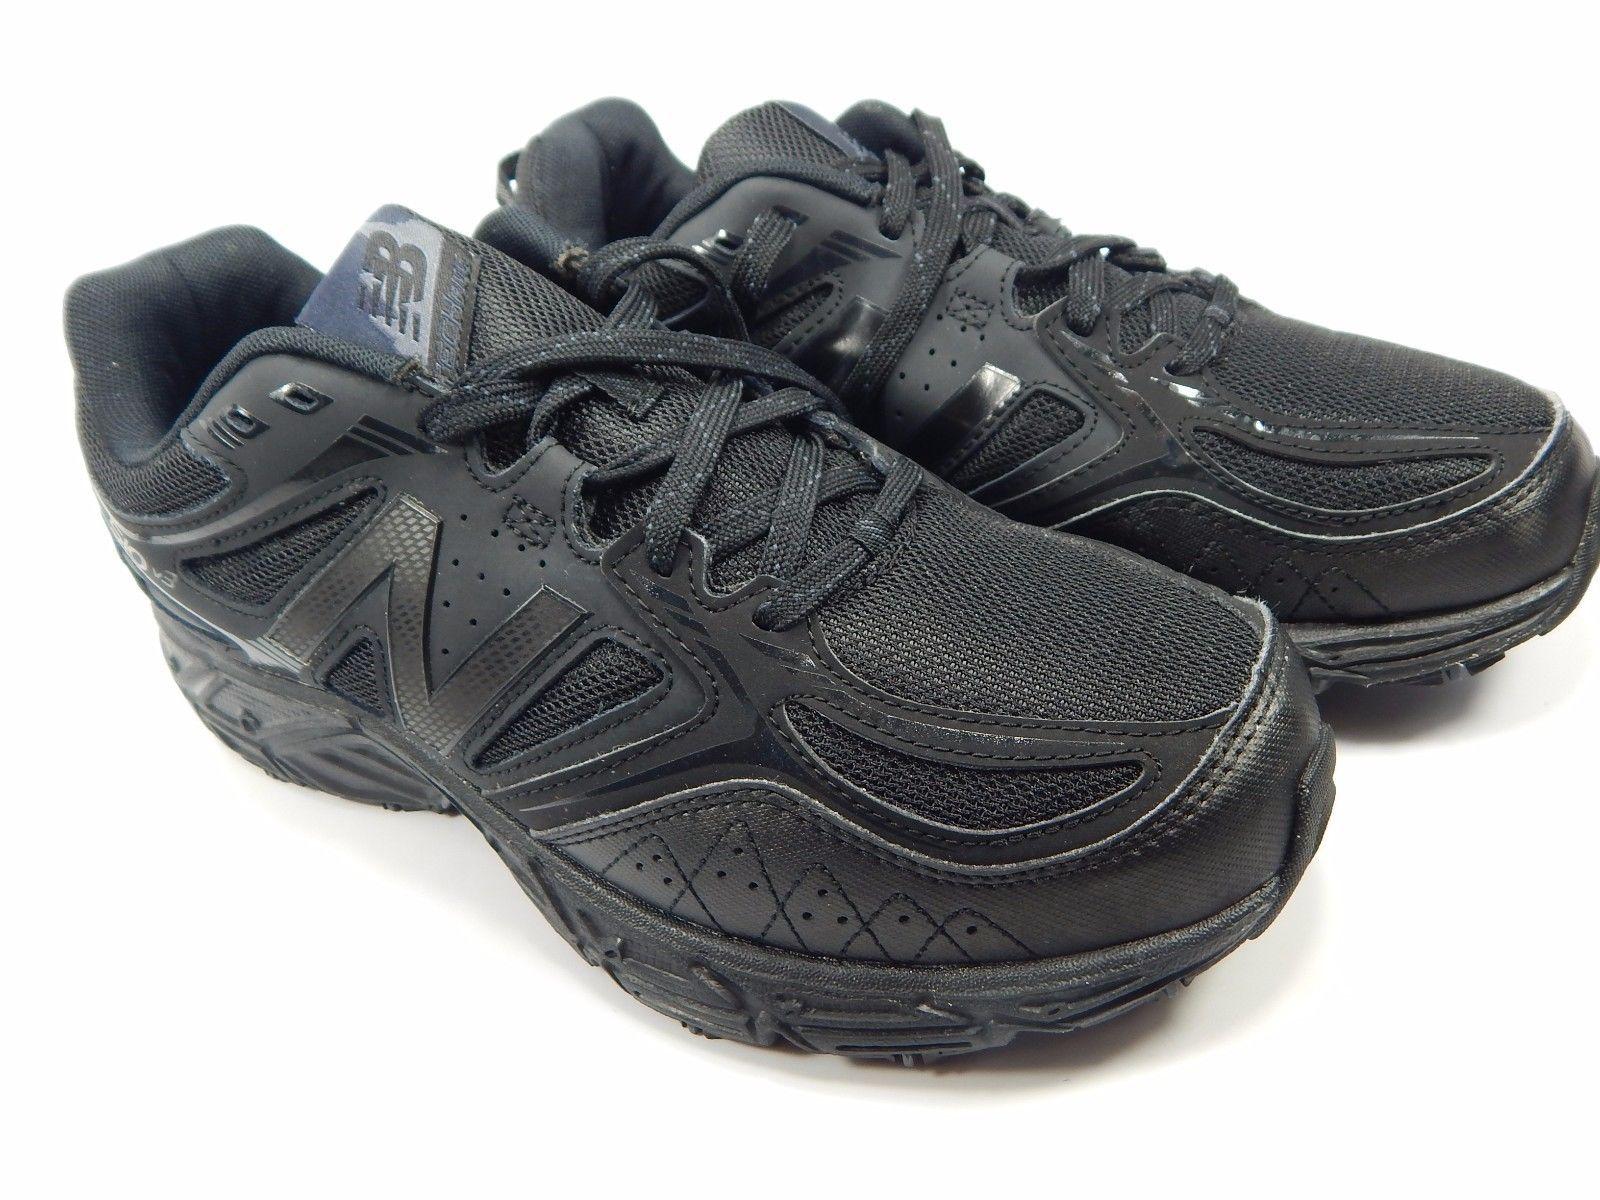 New Balance 510 v3 Men's Trail Running Shoes Sz 8.5 4E EXTRA WIDE EU 42 MT510CB3